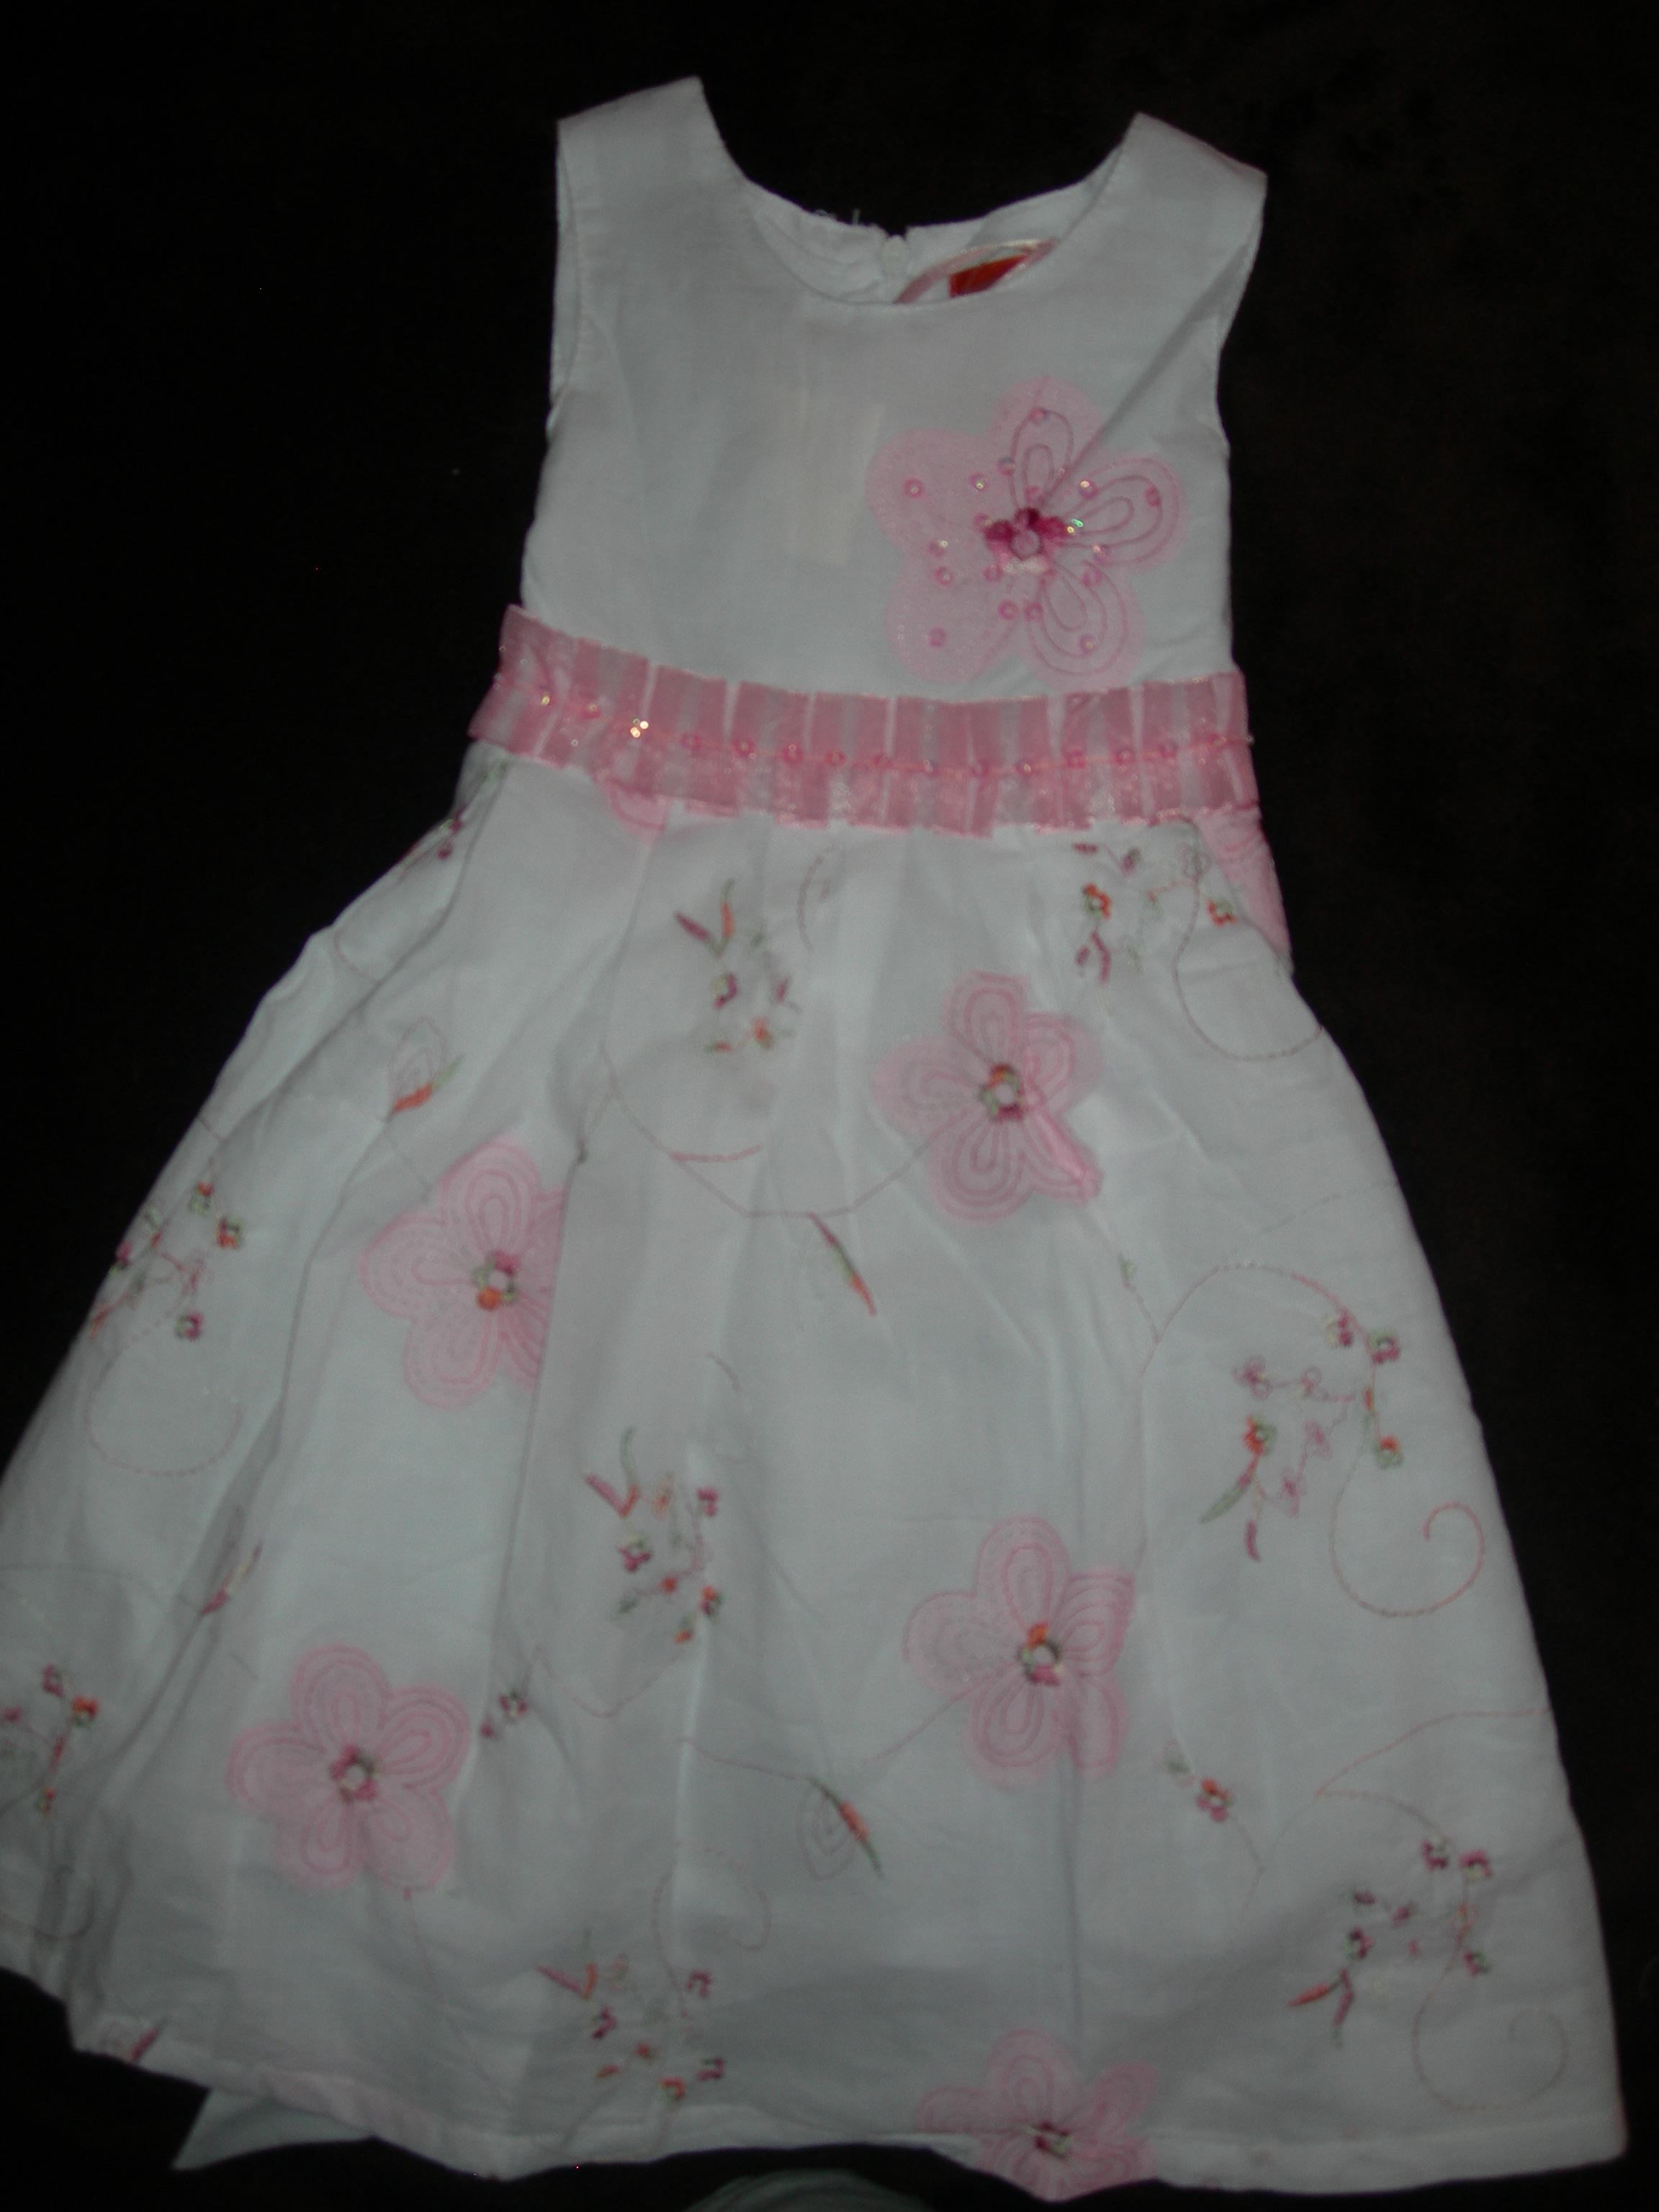 Flower child clothes TheFind